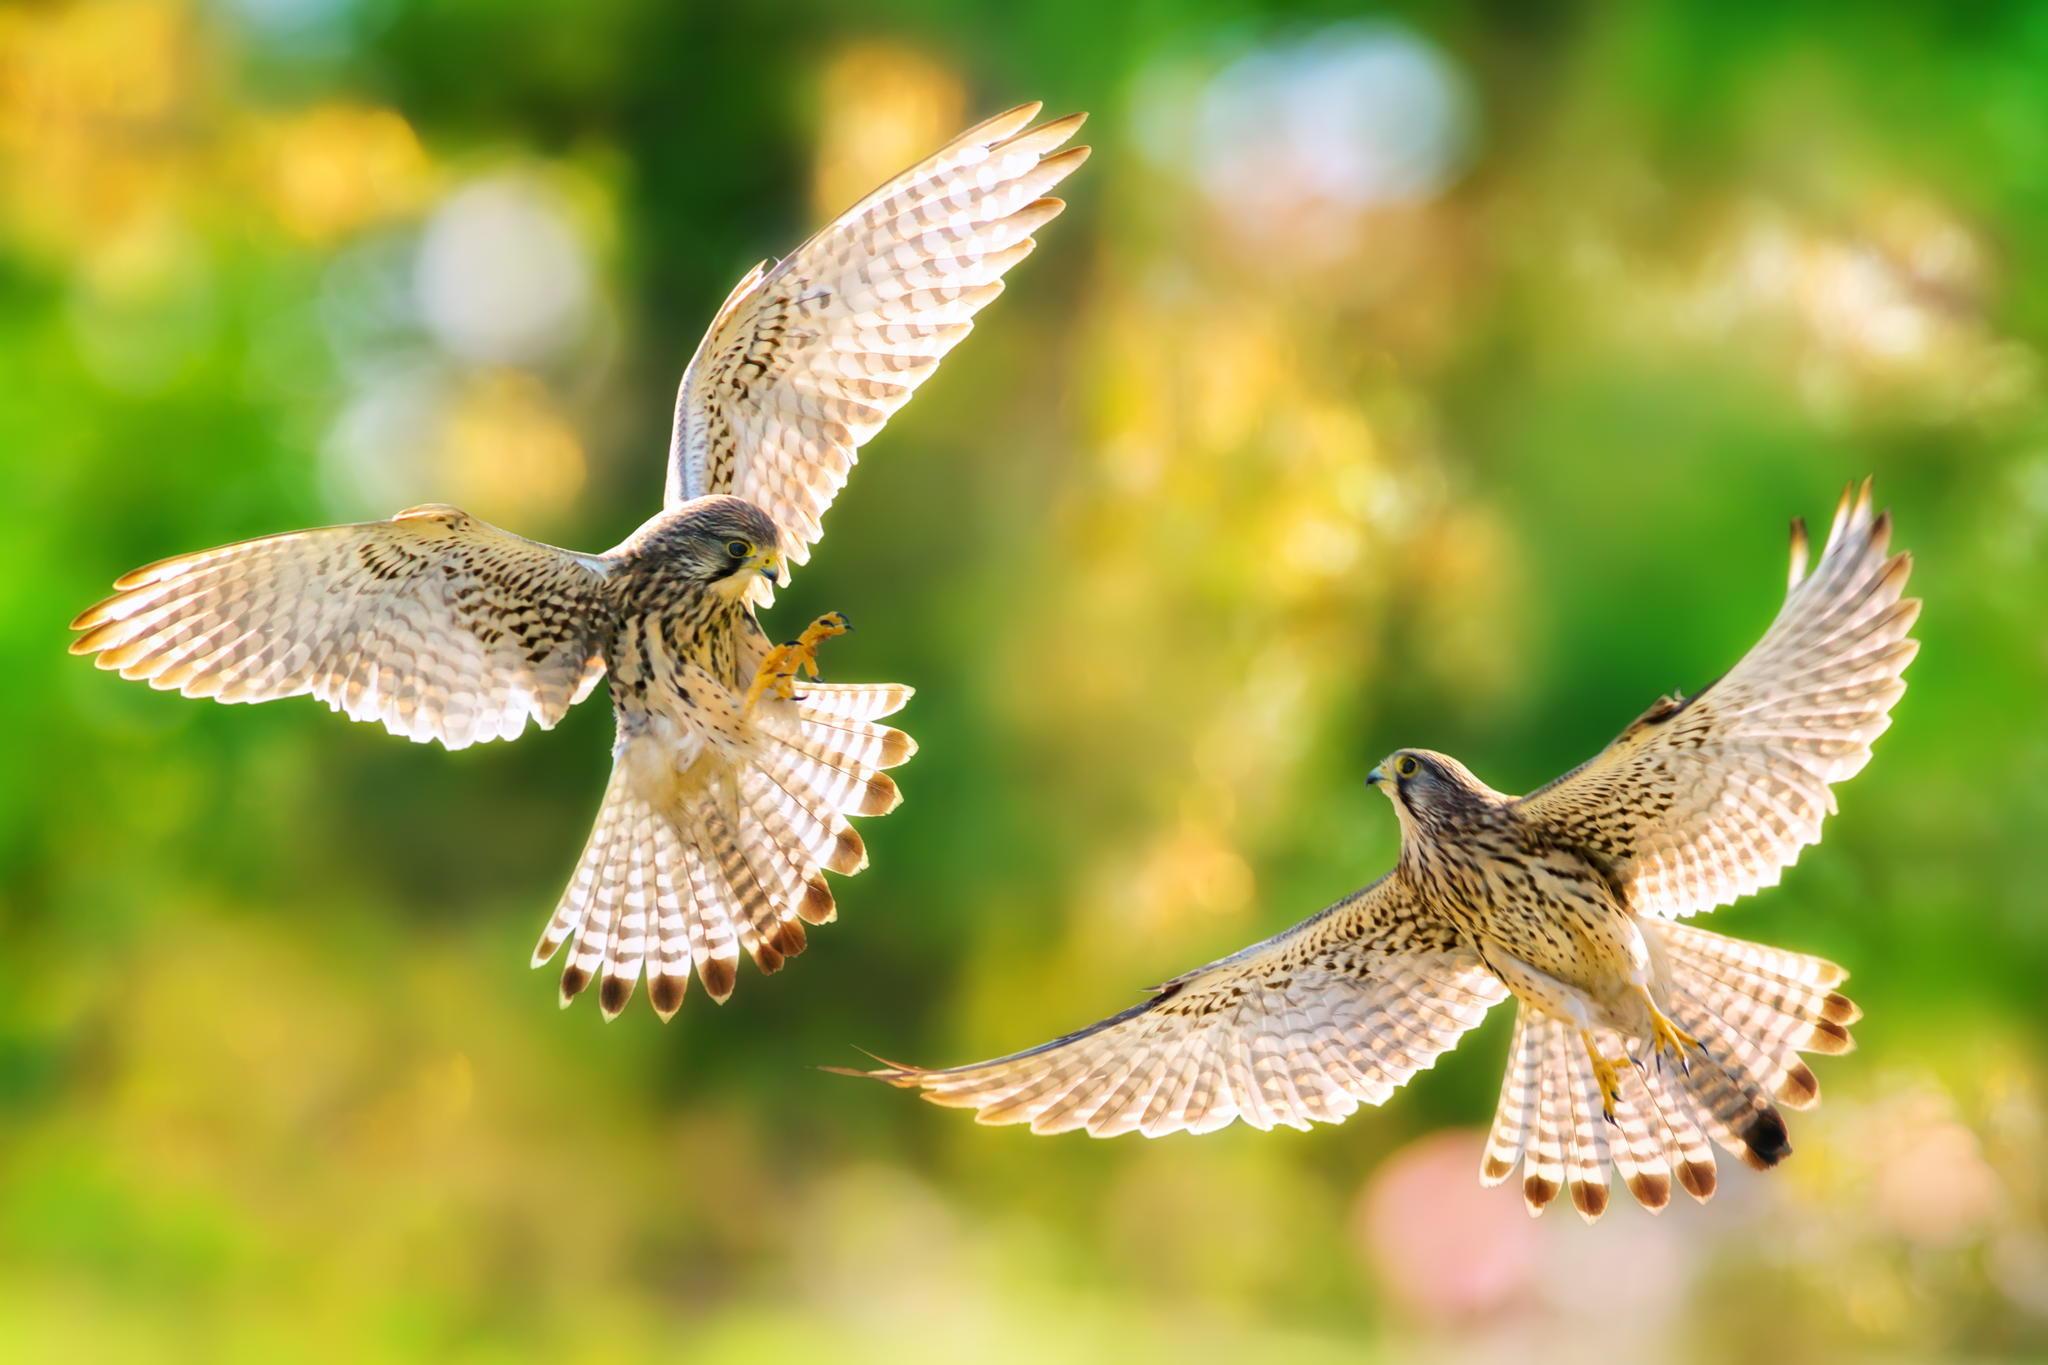 природа животные птица сокол nature animals bird Falcon  № 2993177 без смс